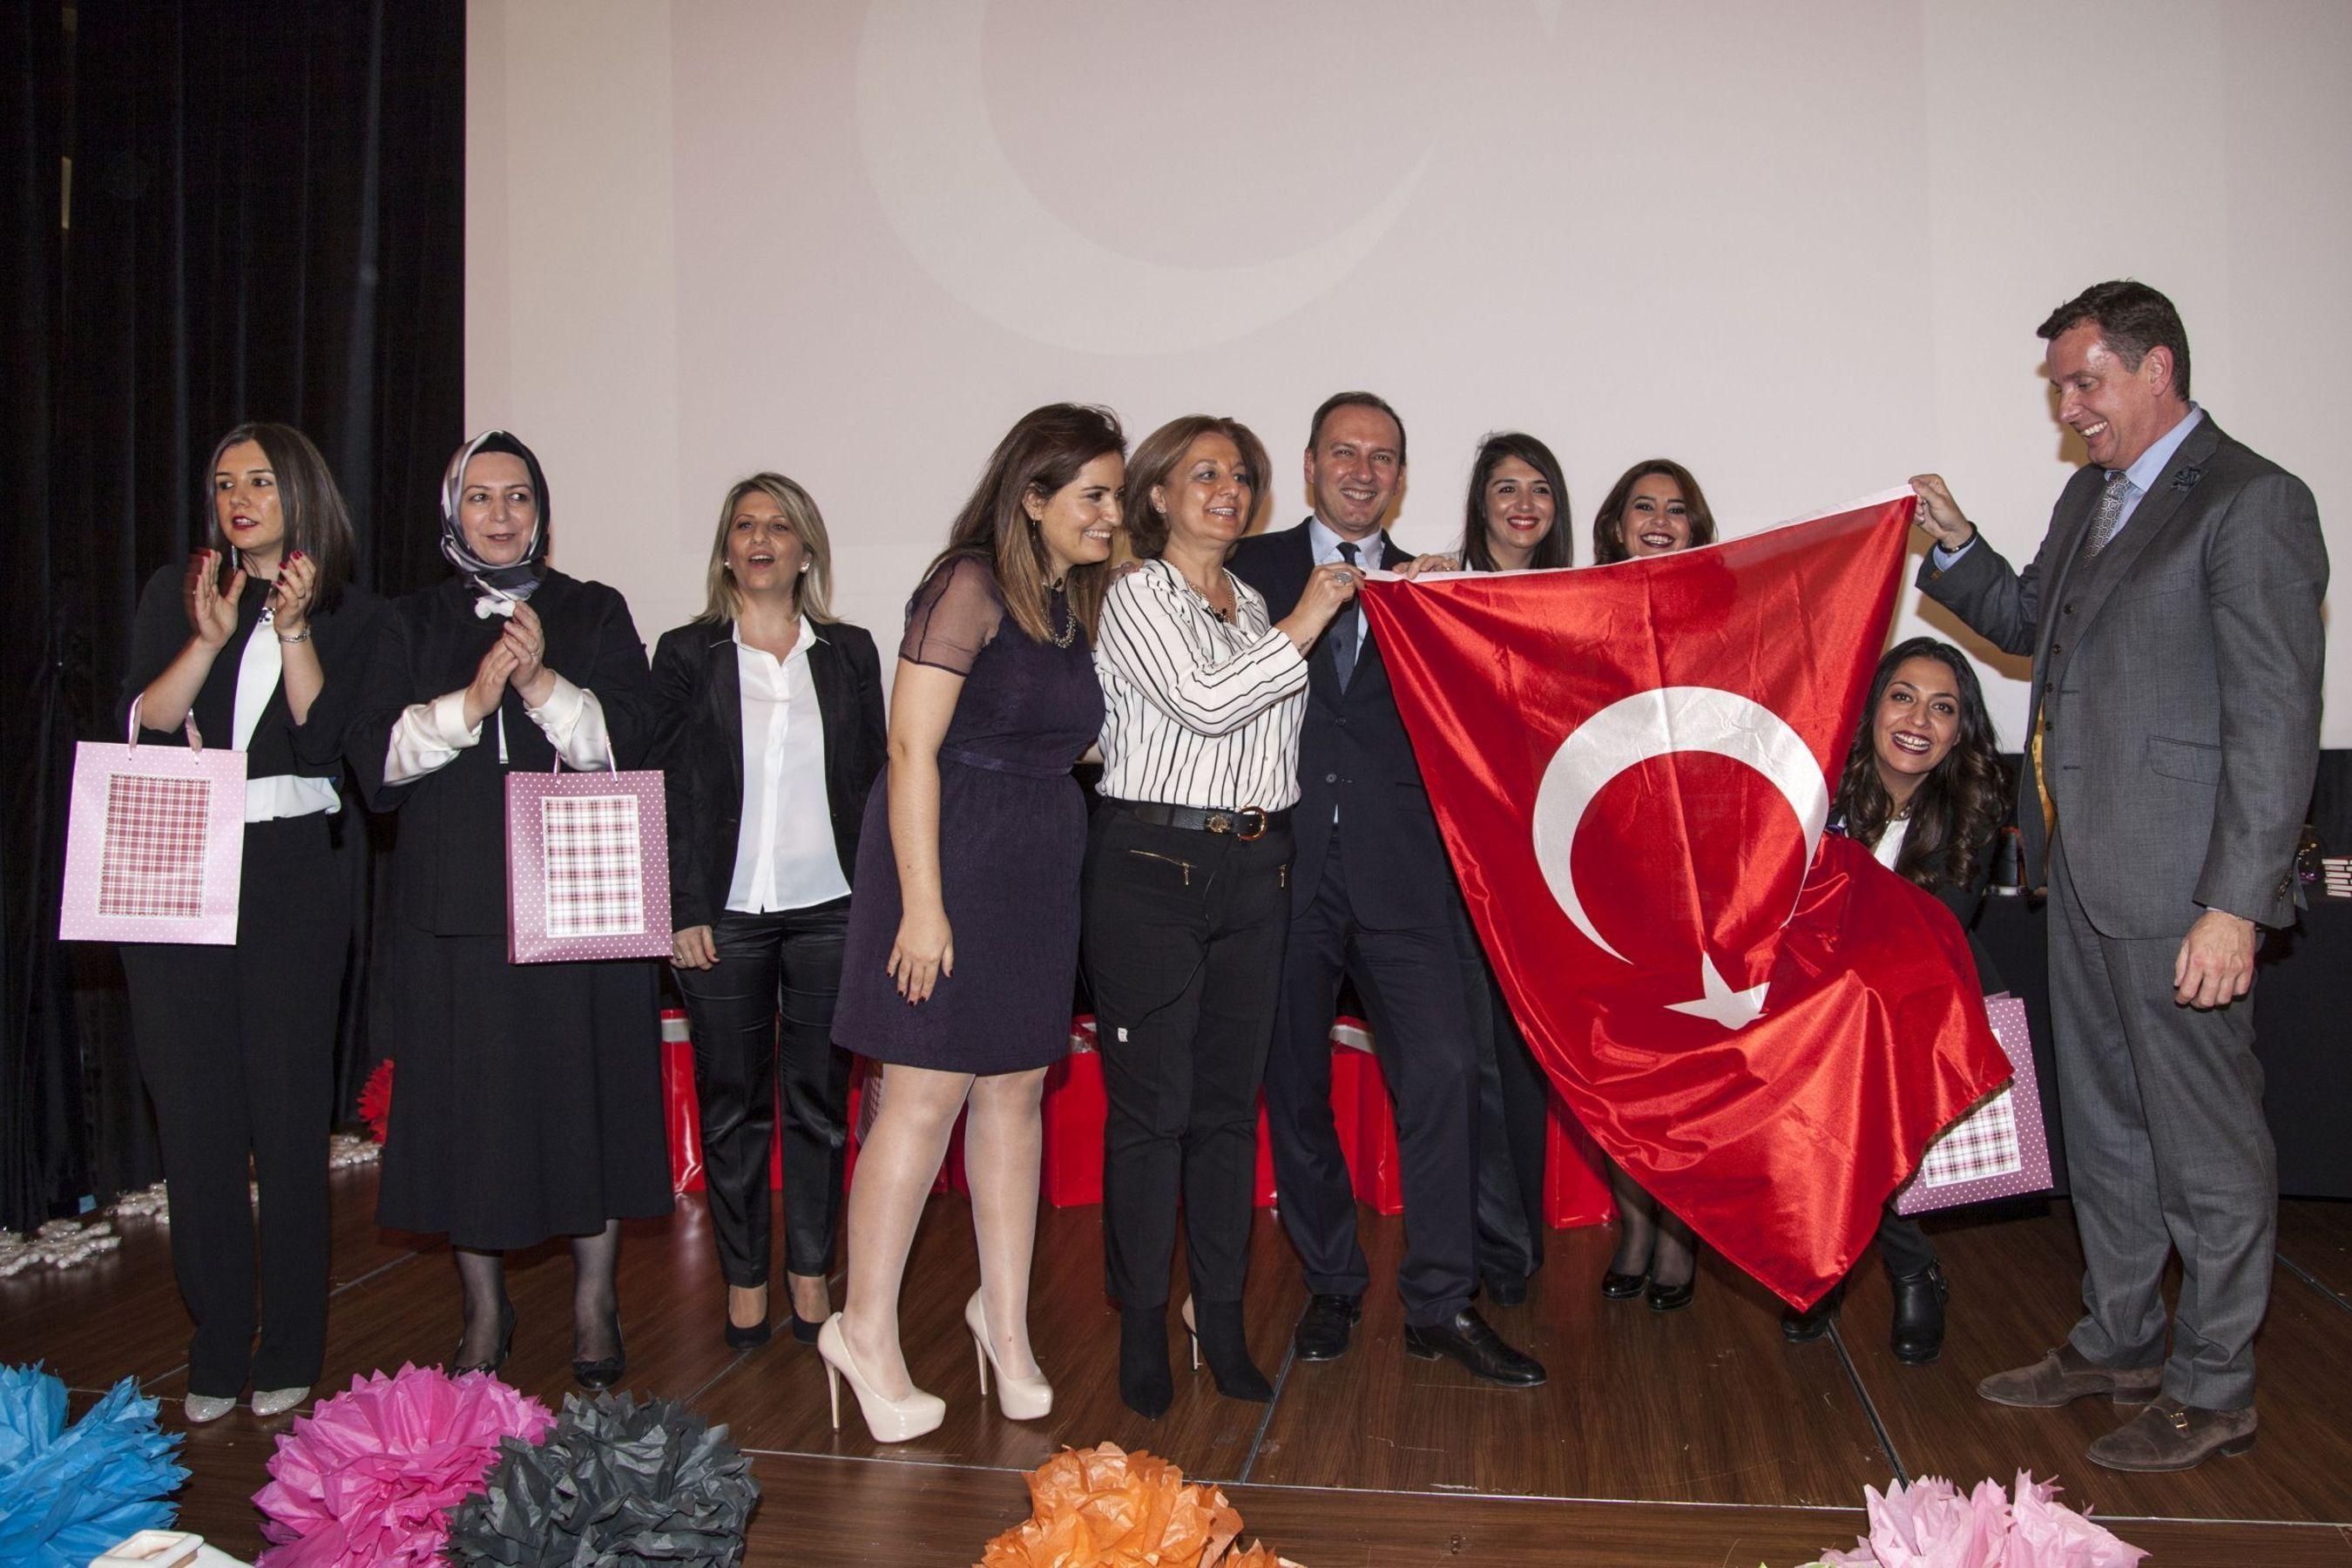 PartyLite Turkey Opening Ceremony in Istanbul: Front middle: Elcin Birben, Hurcan Haydar (holding flag), Luca Pozzoli and Martin Kohler (holding flag) (PRNewsFoto/PartyLite)